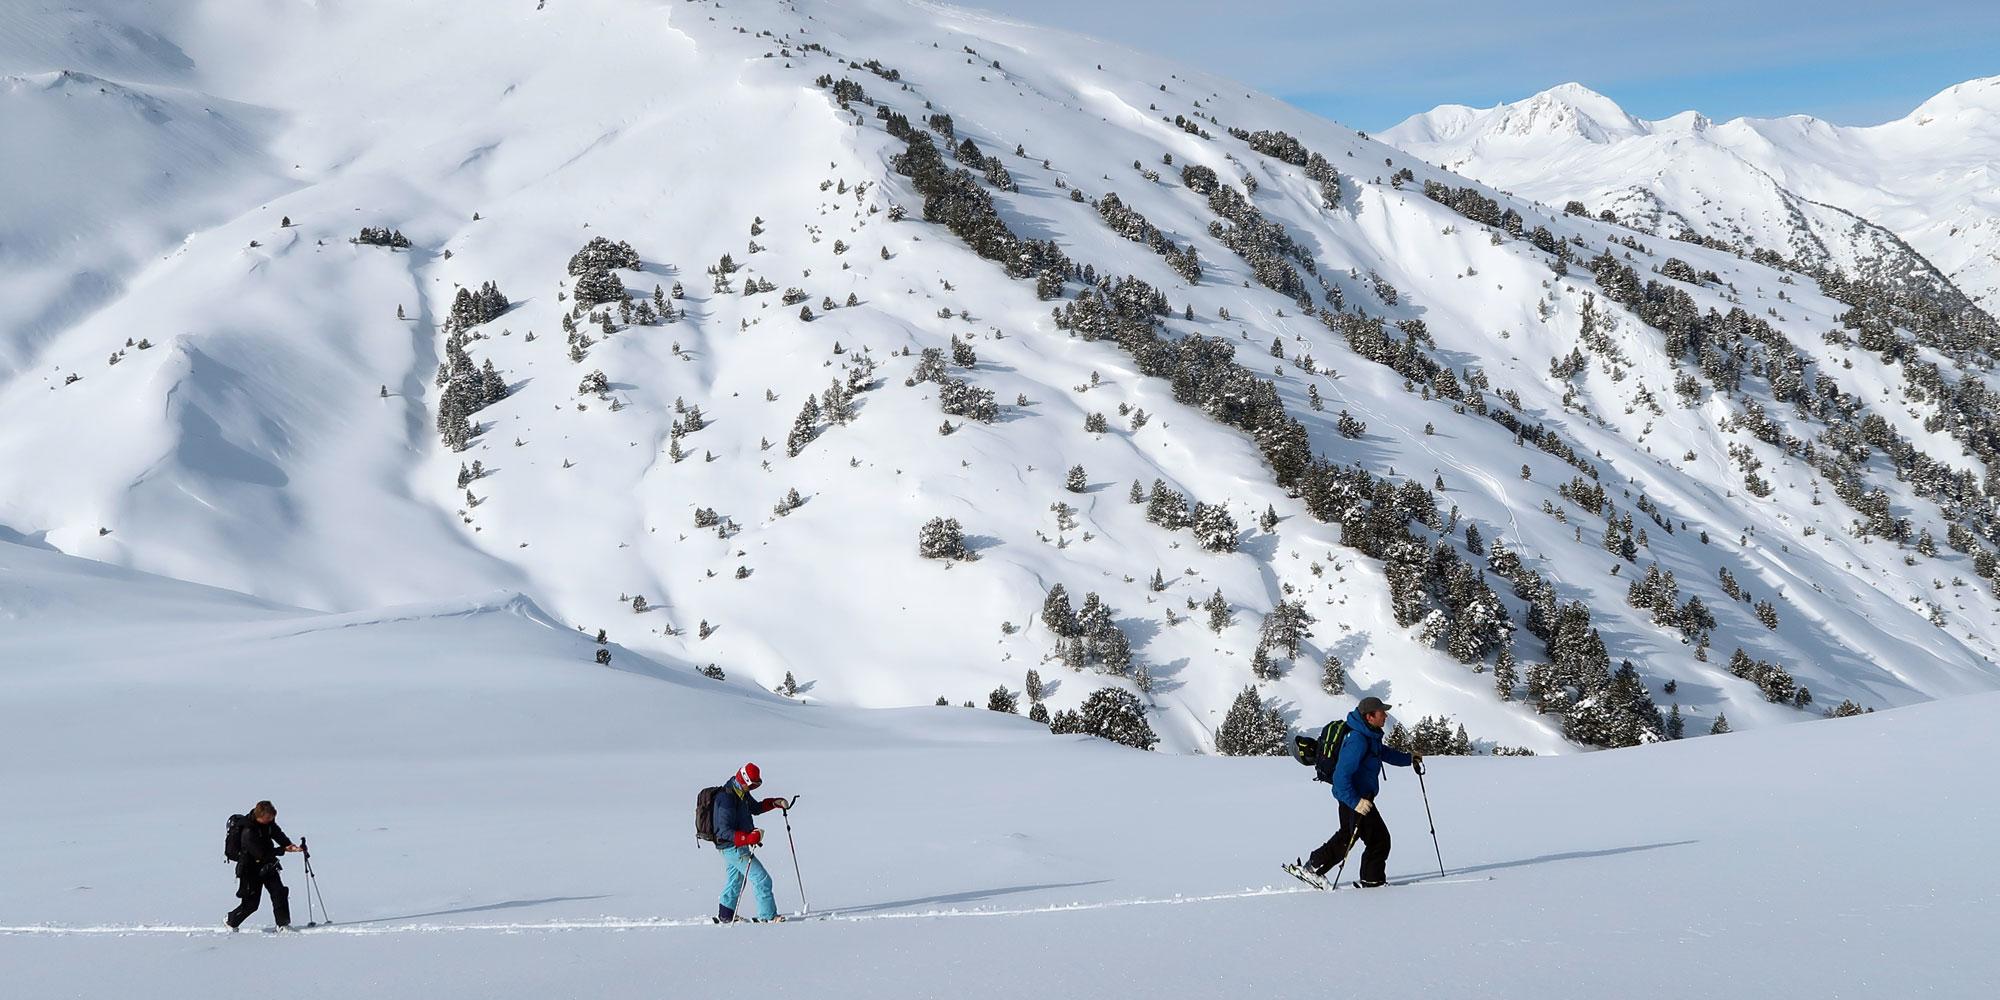 Off-piste skiers